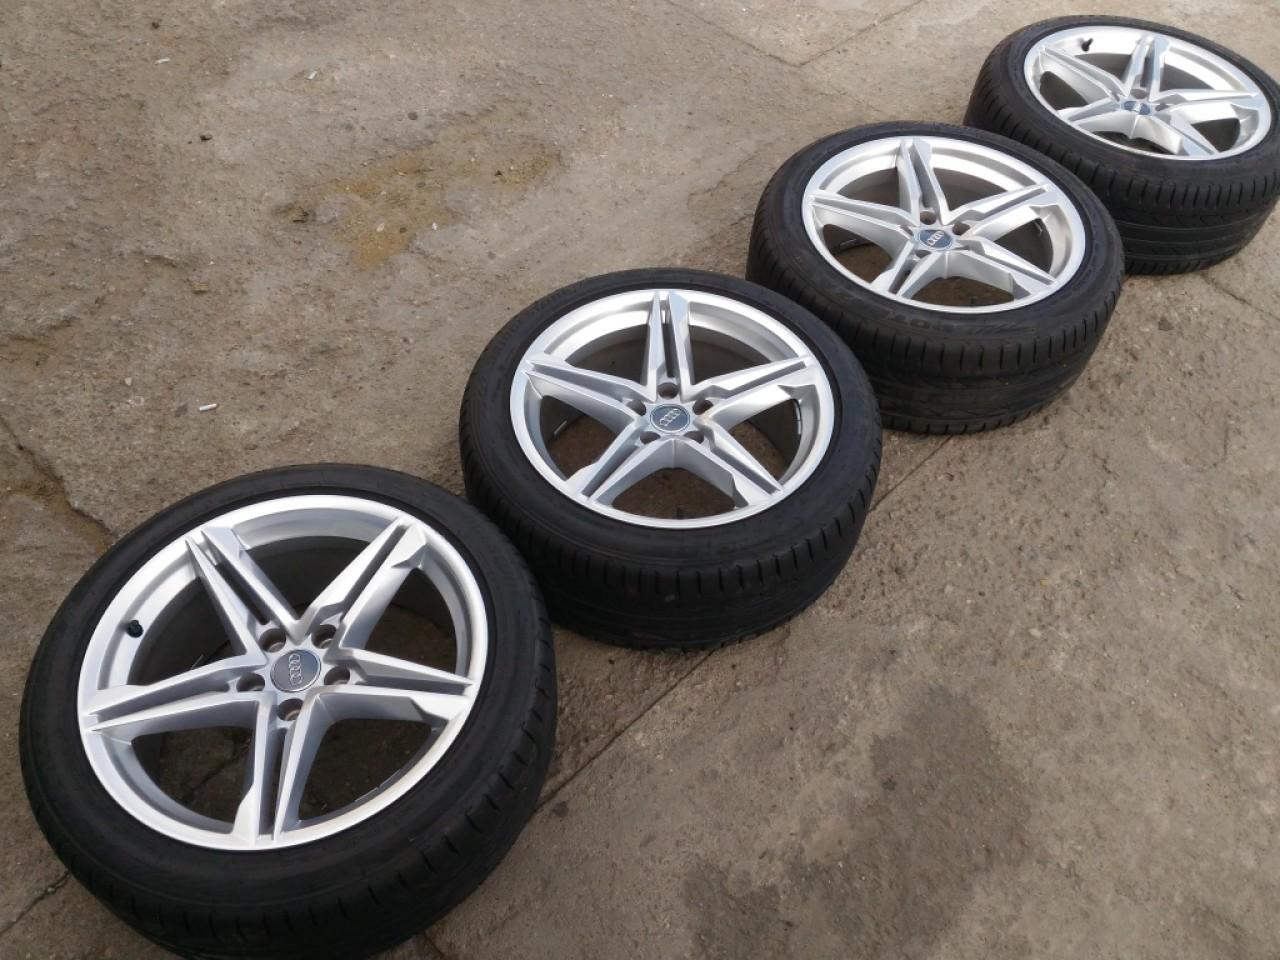 Set jante aliaj pe 18 5x112 8,5J ET 29 + anvelope Bridgestone Potenza 245/40 R18 dot (1817) Audi VW